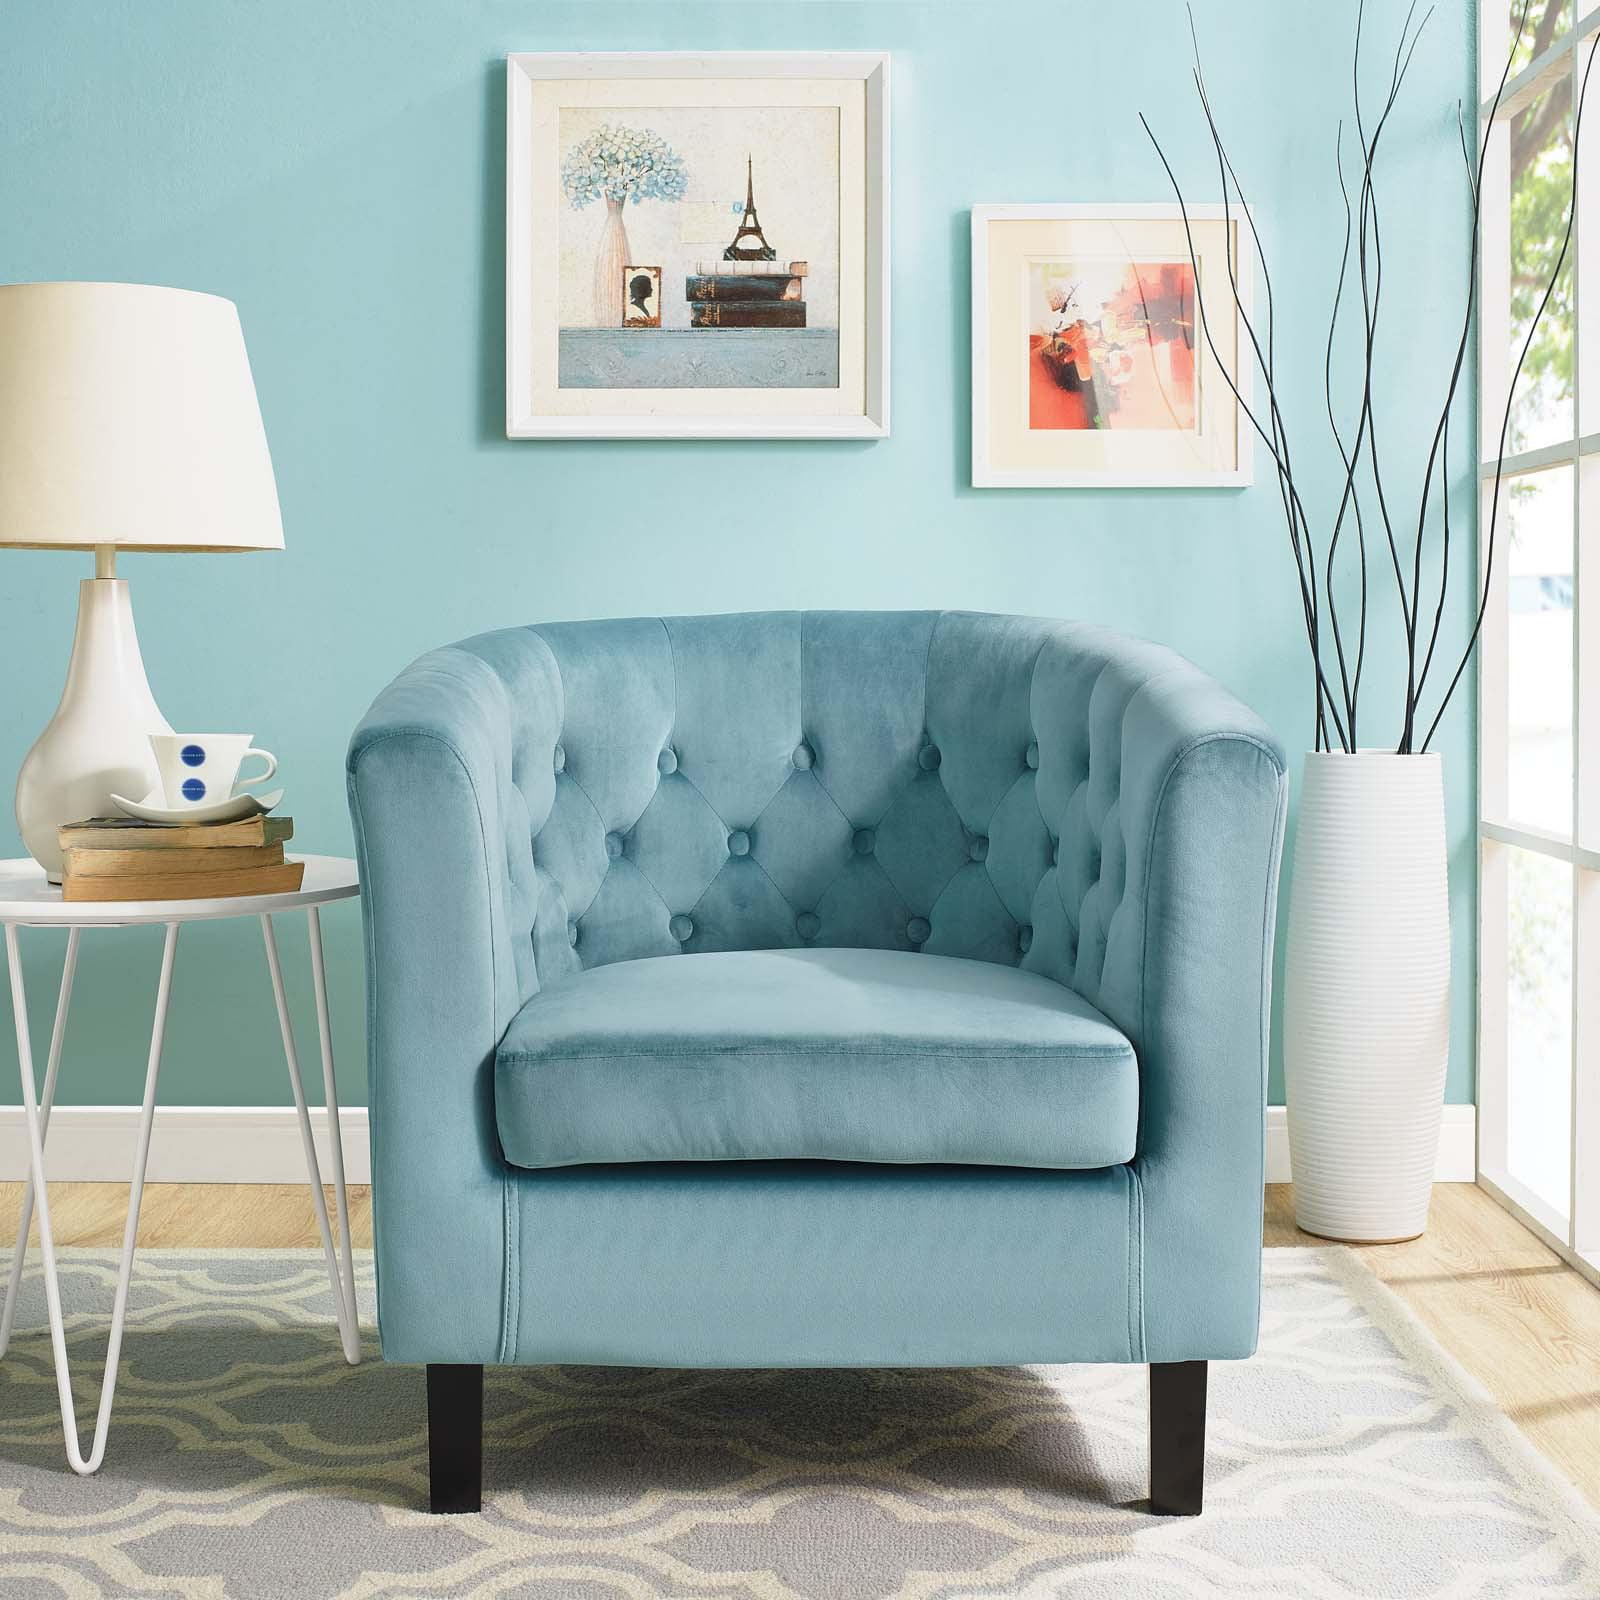 Modway Prospect Velvet Upholstered Armchair, Multiple Colors by Modway